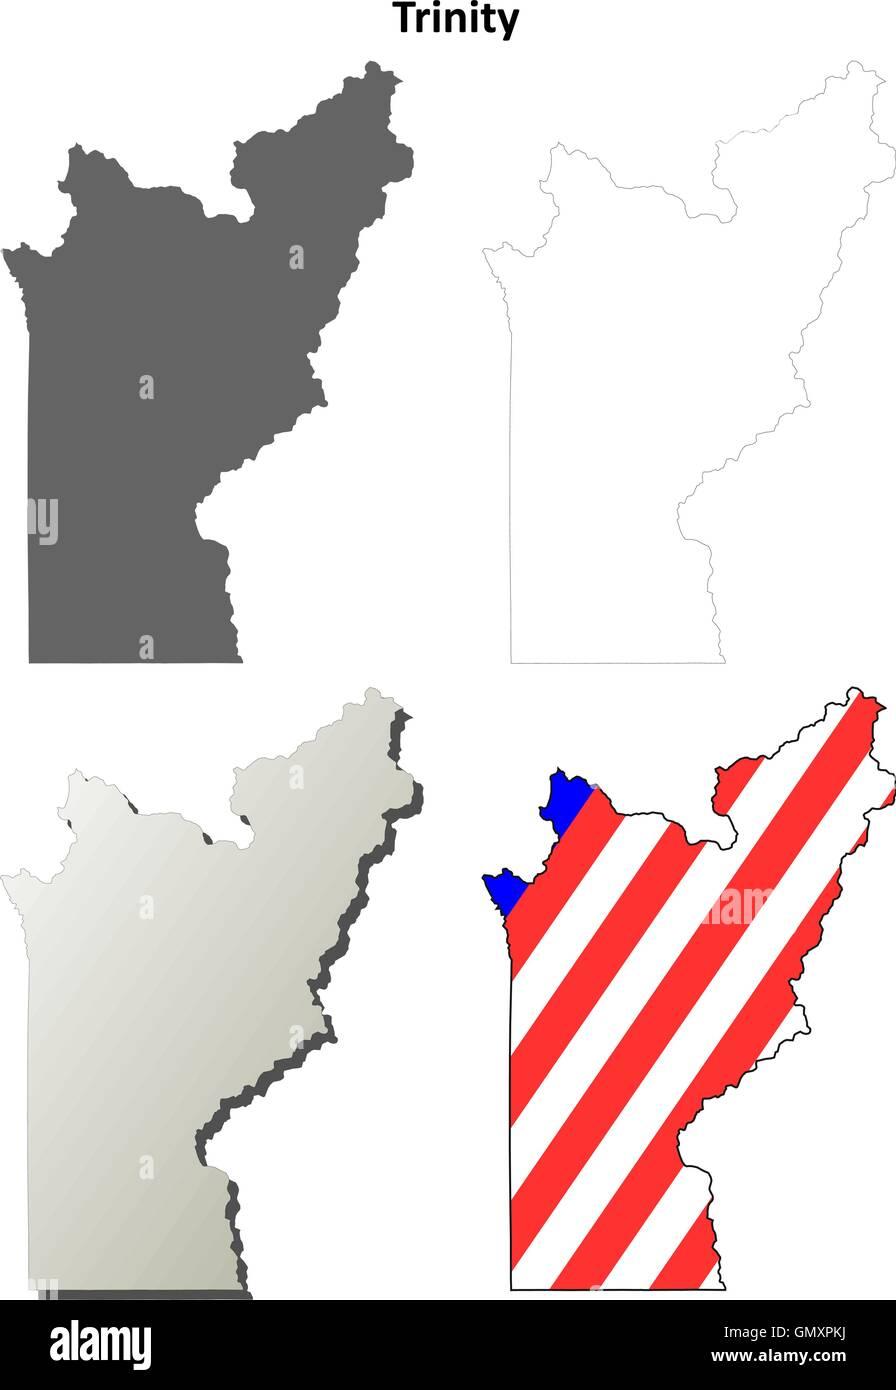 Trinity County, California outline map set - Stock Vector